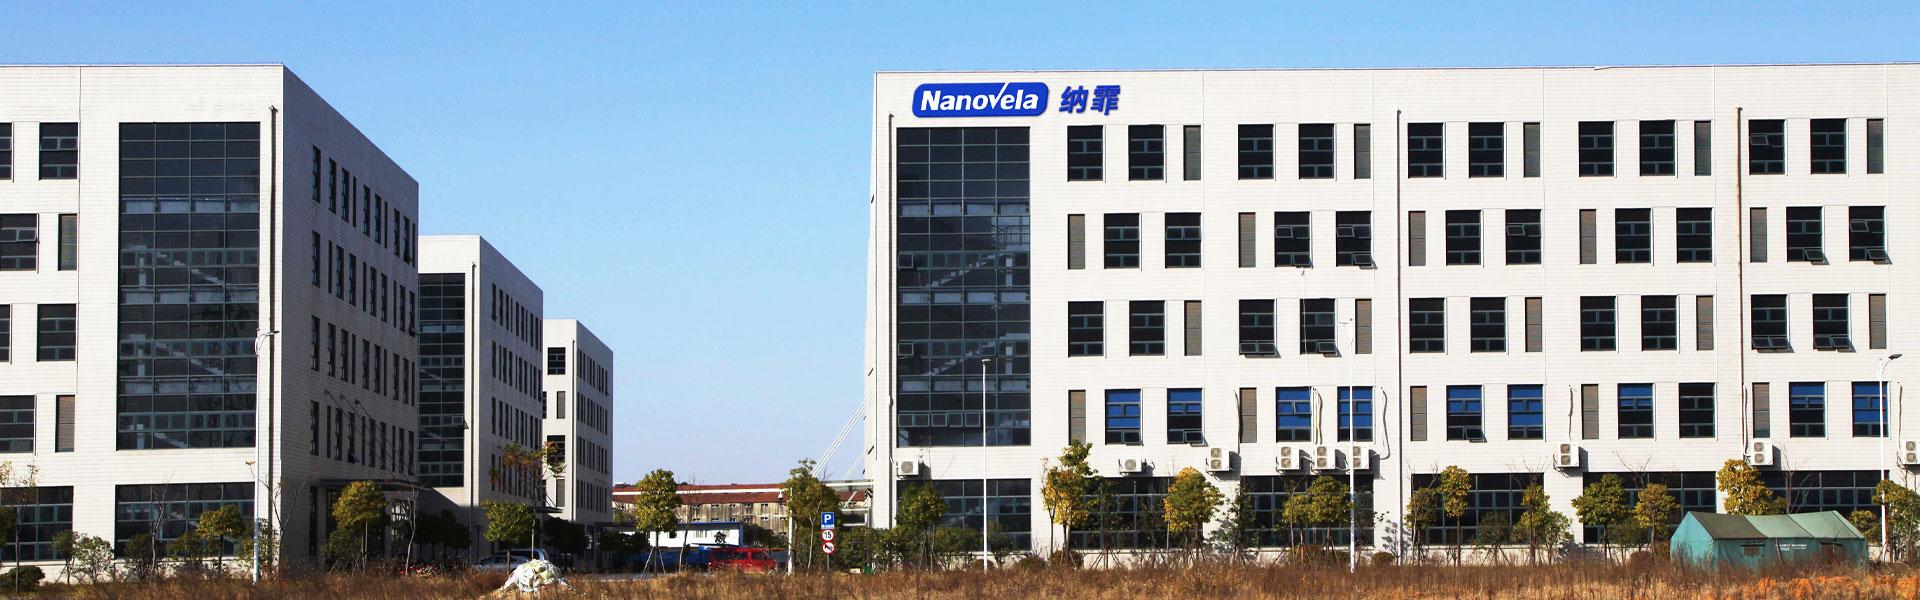 nanovela banner1